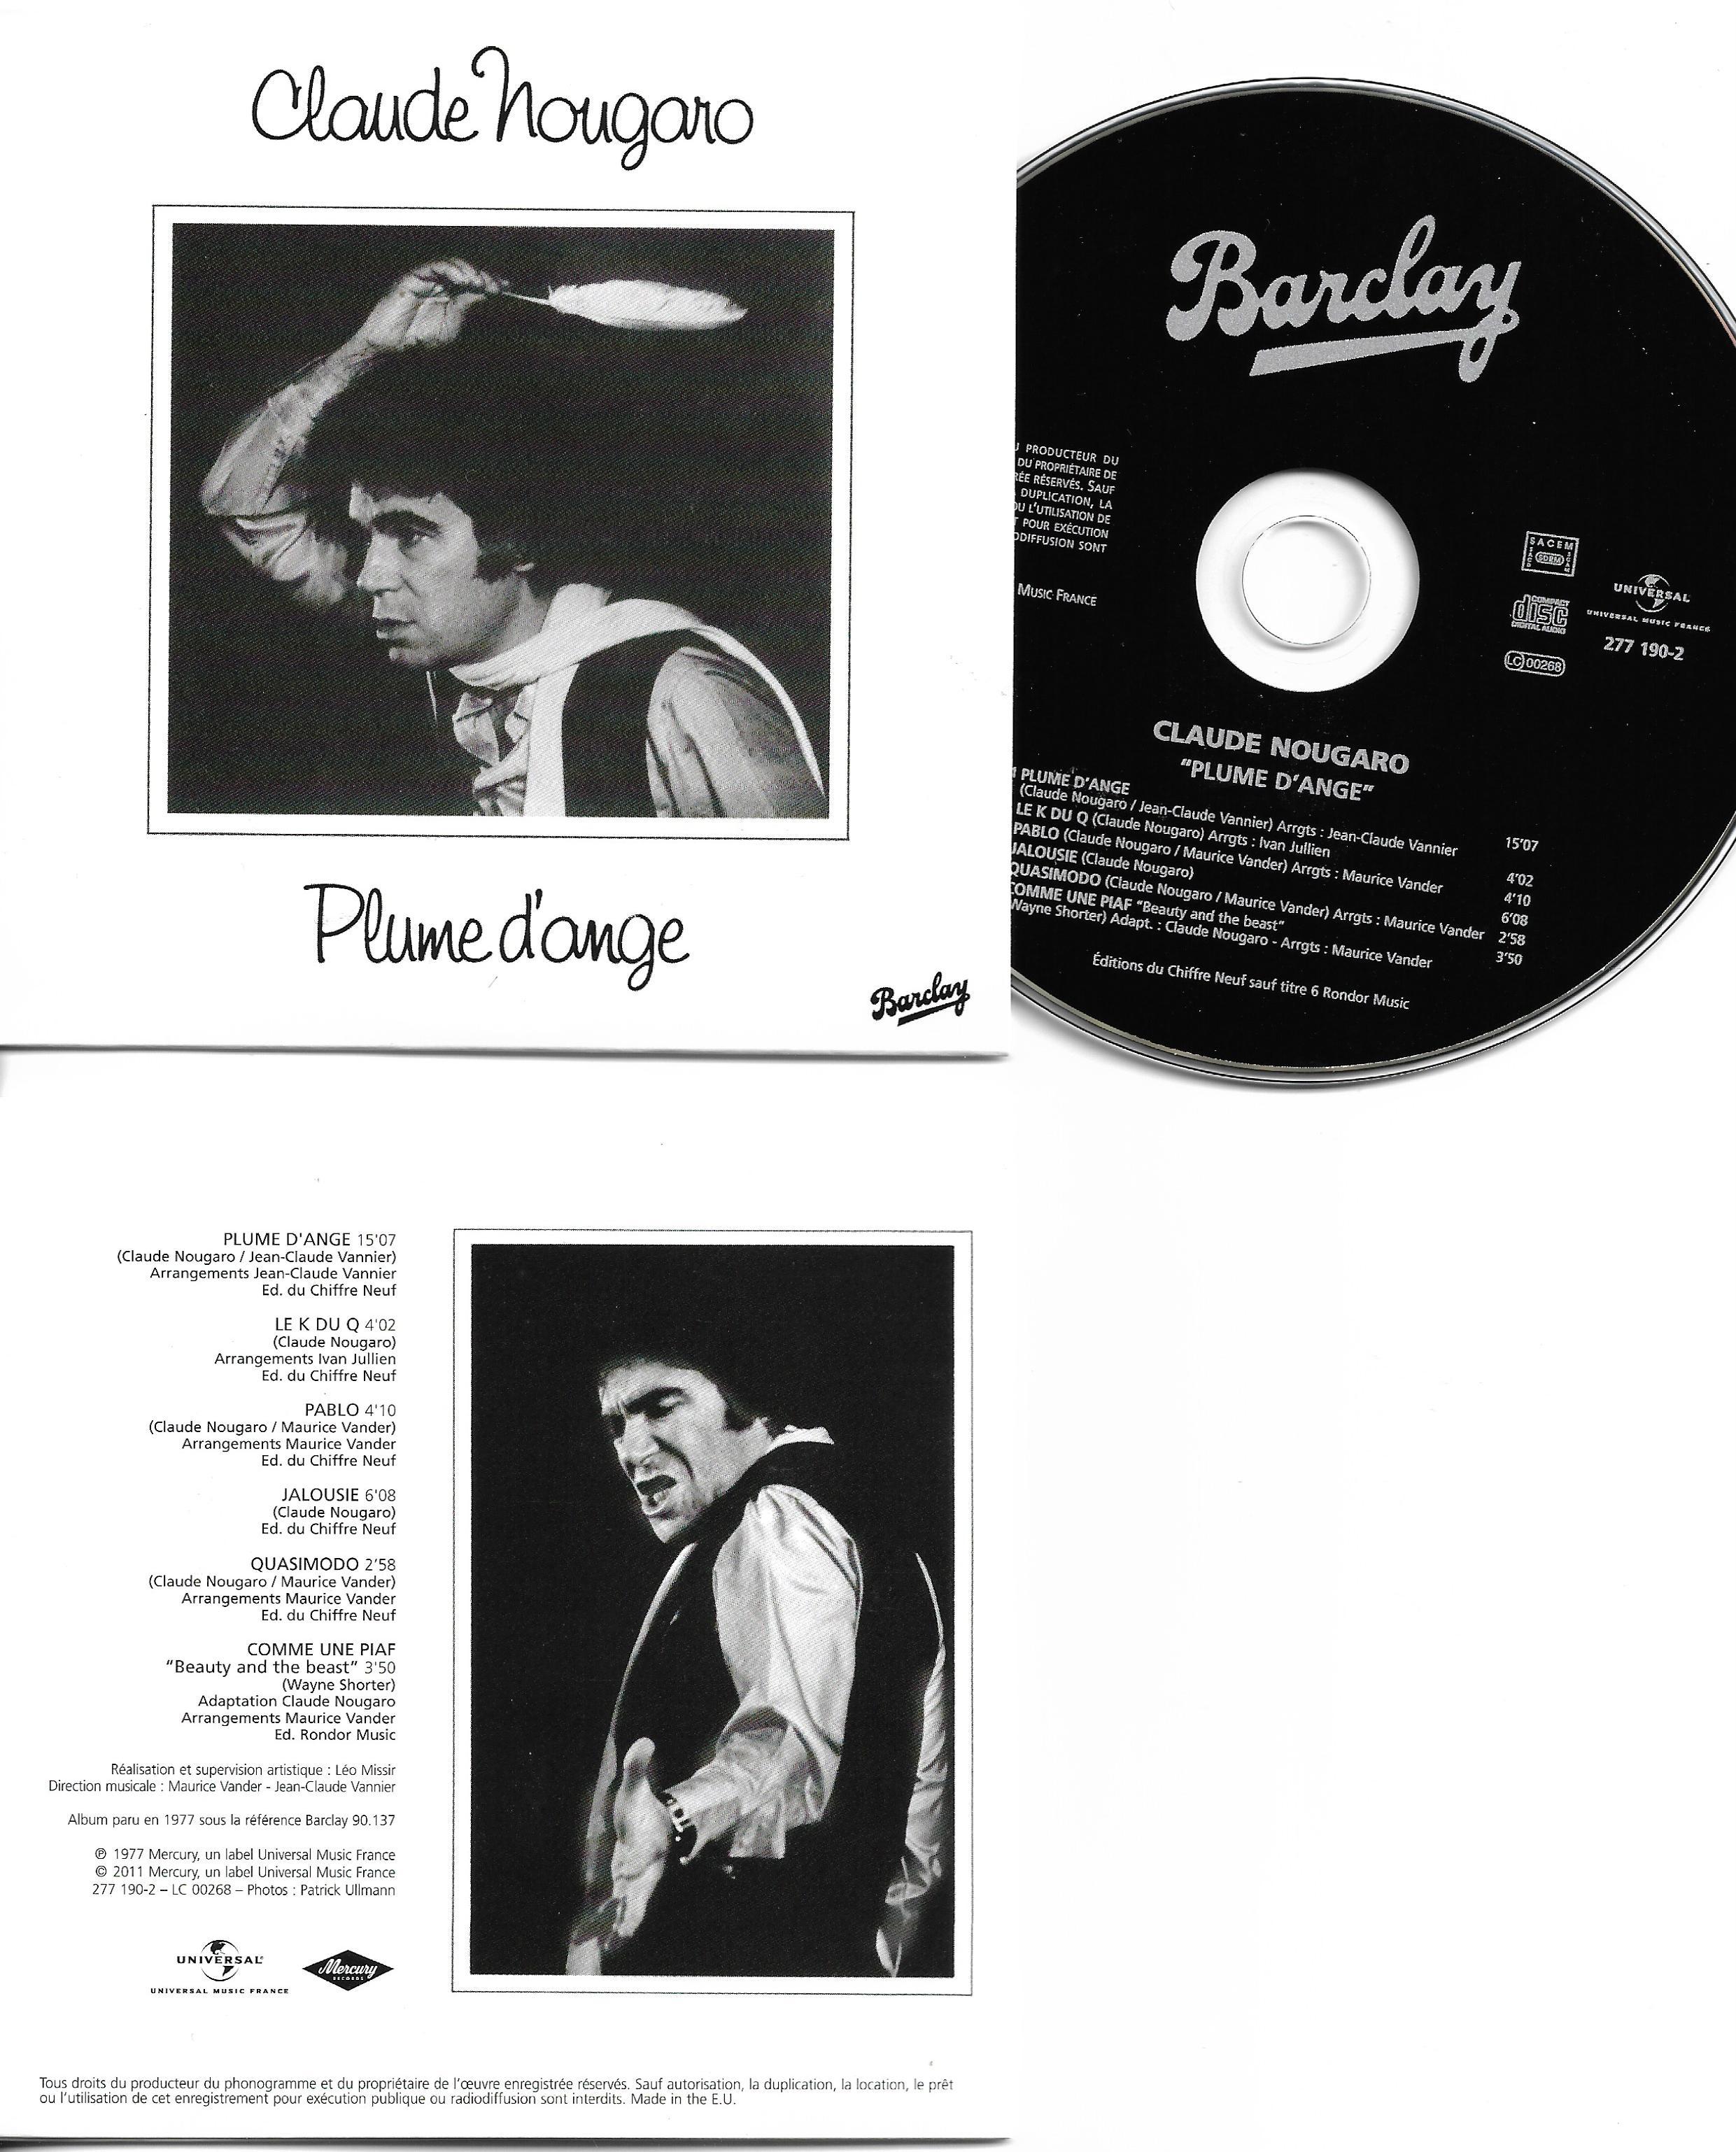 CLAUDE NOUGARO - Plume d'ange MINI LP REPLICA CARD SLEEVE - 6-TRACK - CD